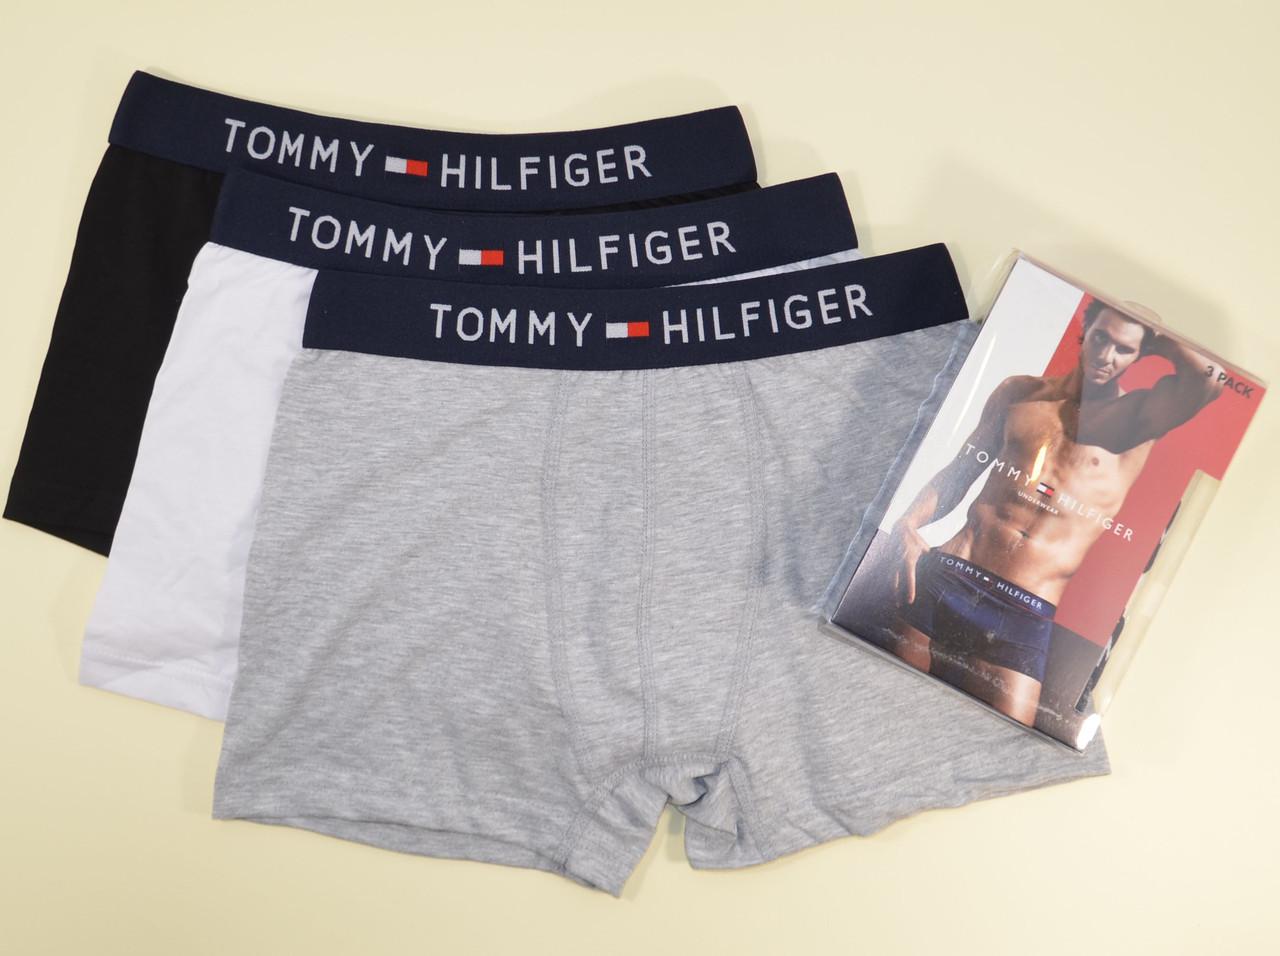 Мужские трусы Tommy Hilfiger (боксеры)